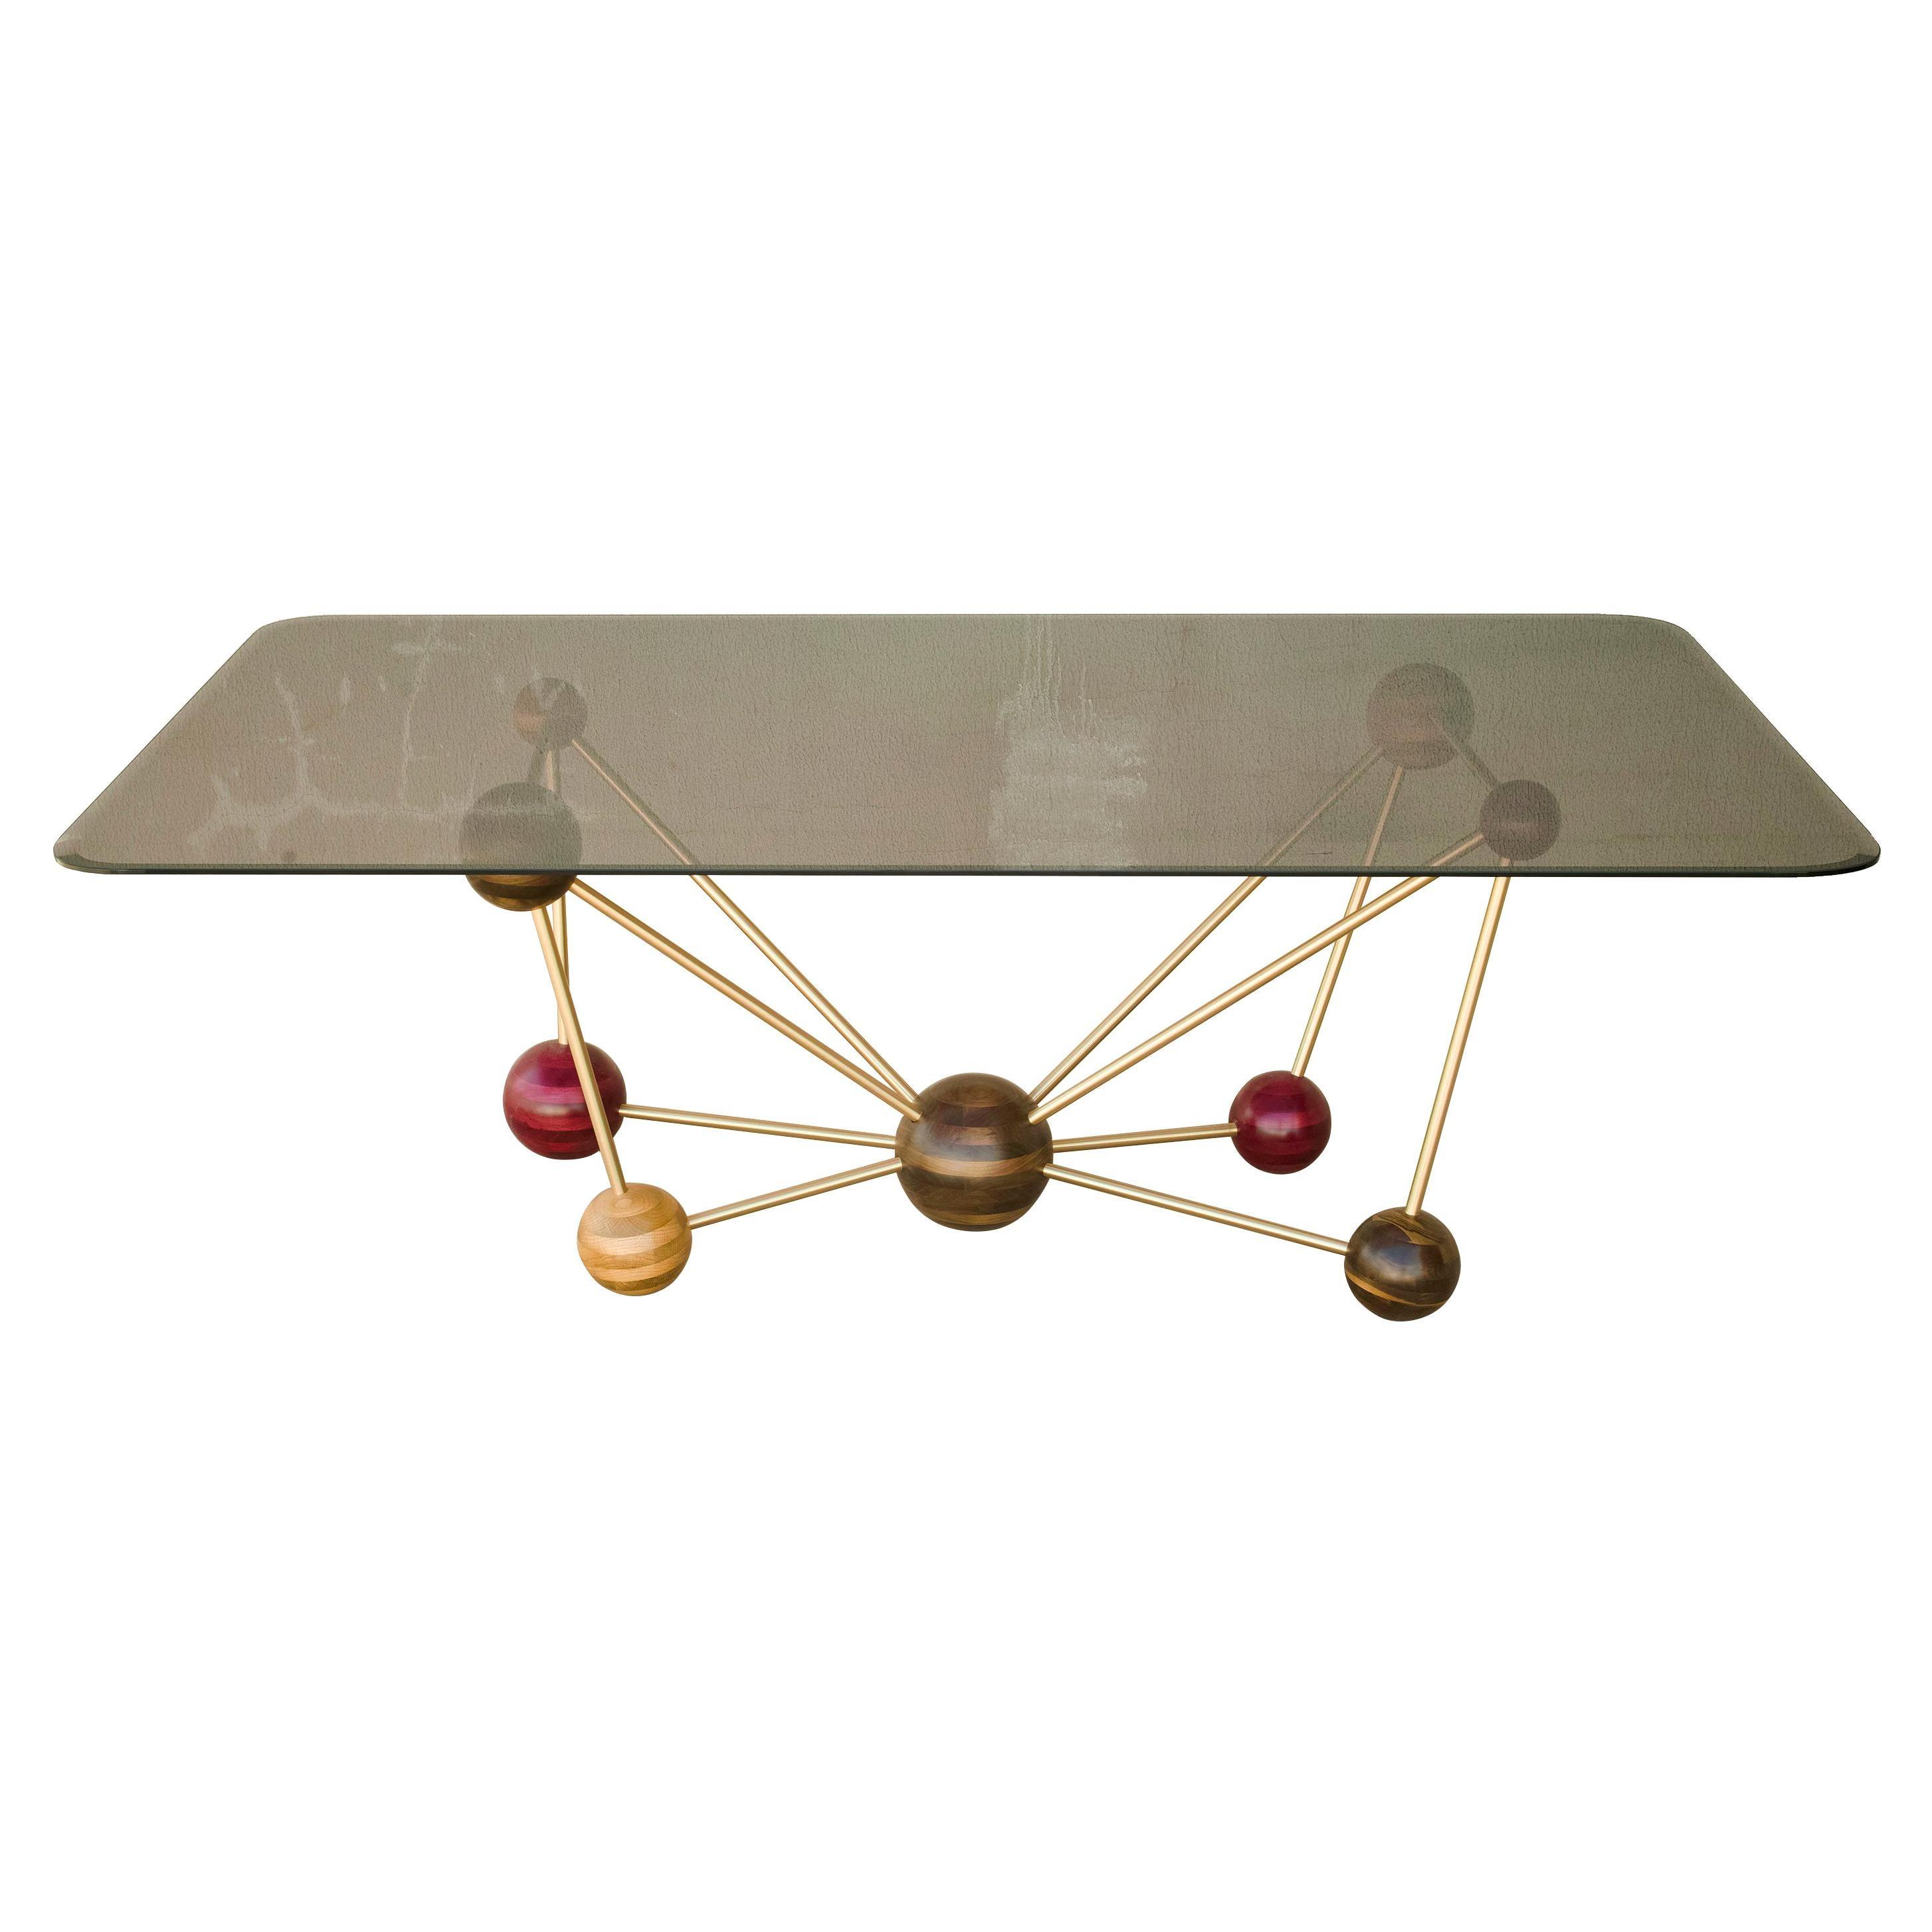 Molecule, StudioManda, Dining Table, Wood, Smoked Glass, Brass, Lebanon, 2014